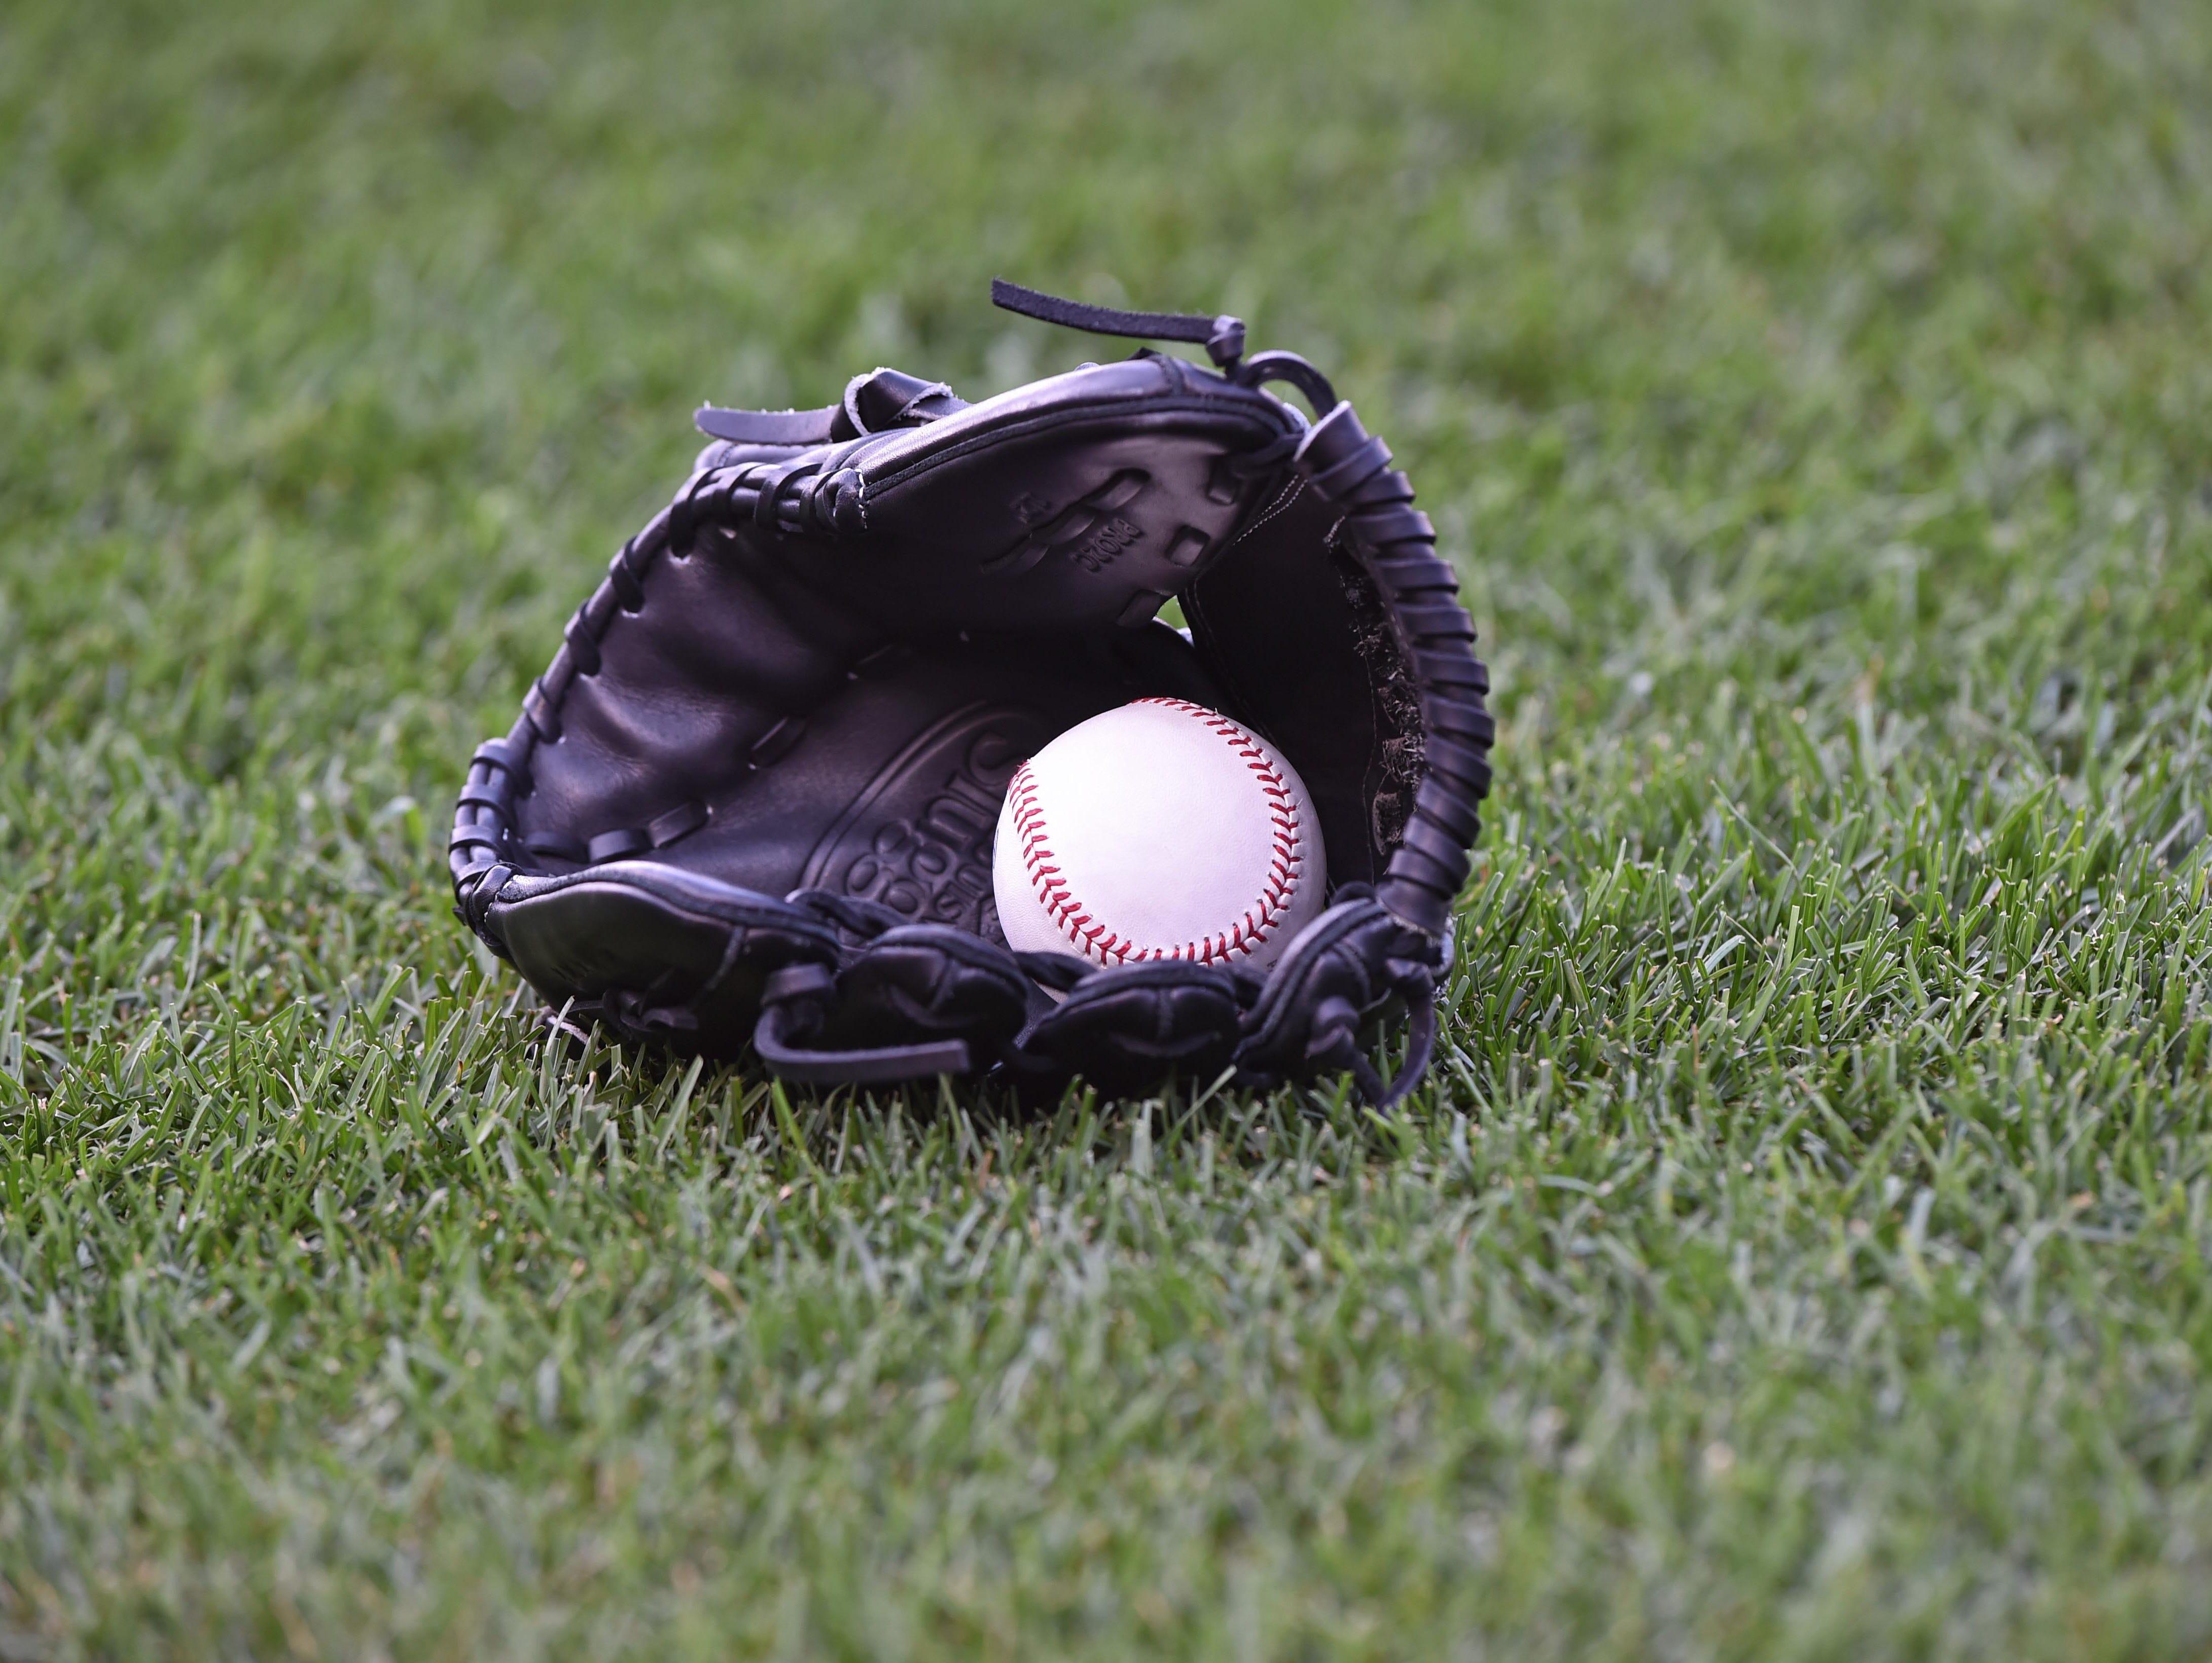 The Fossil Ridge baseball team won a tournament game in Arizona on Monday.